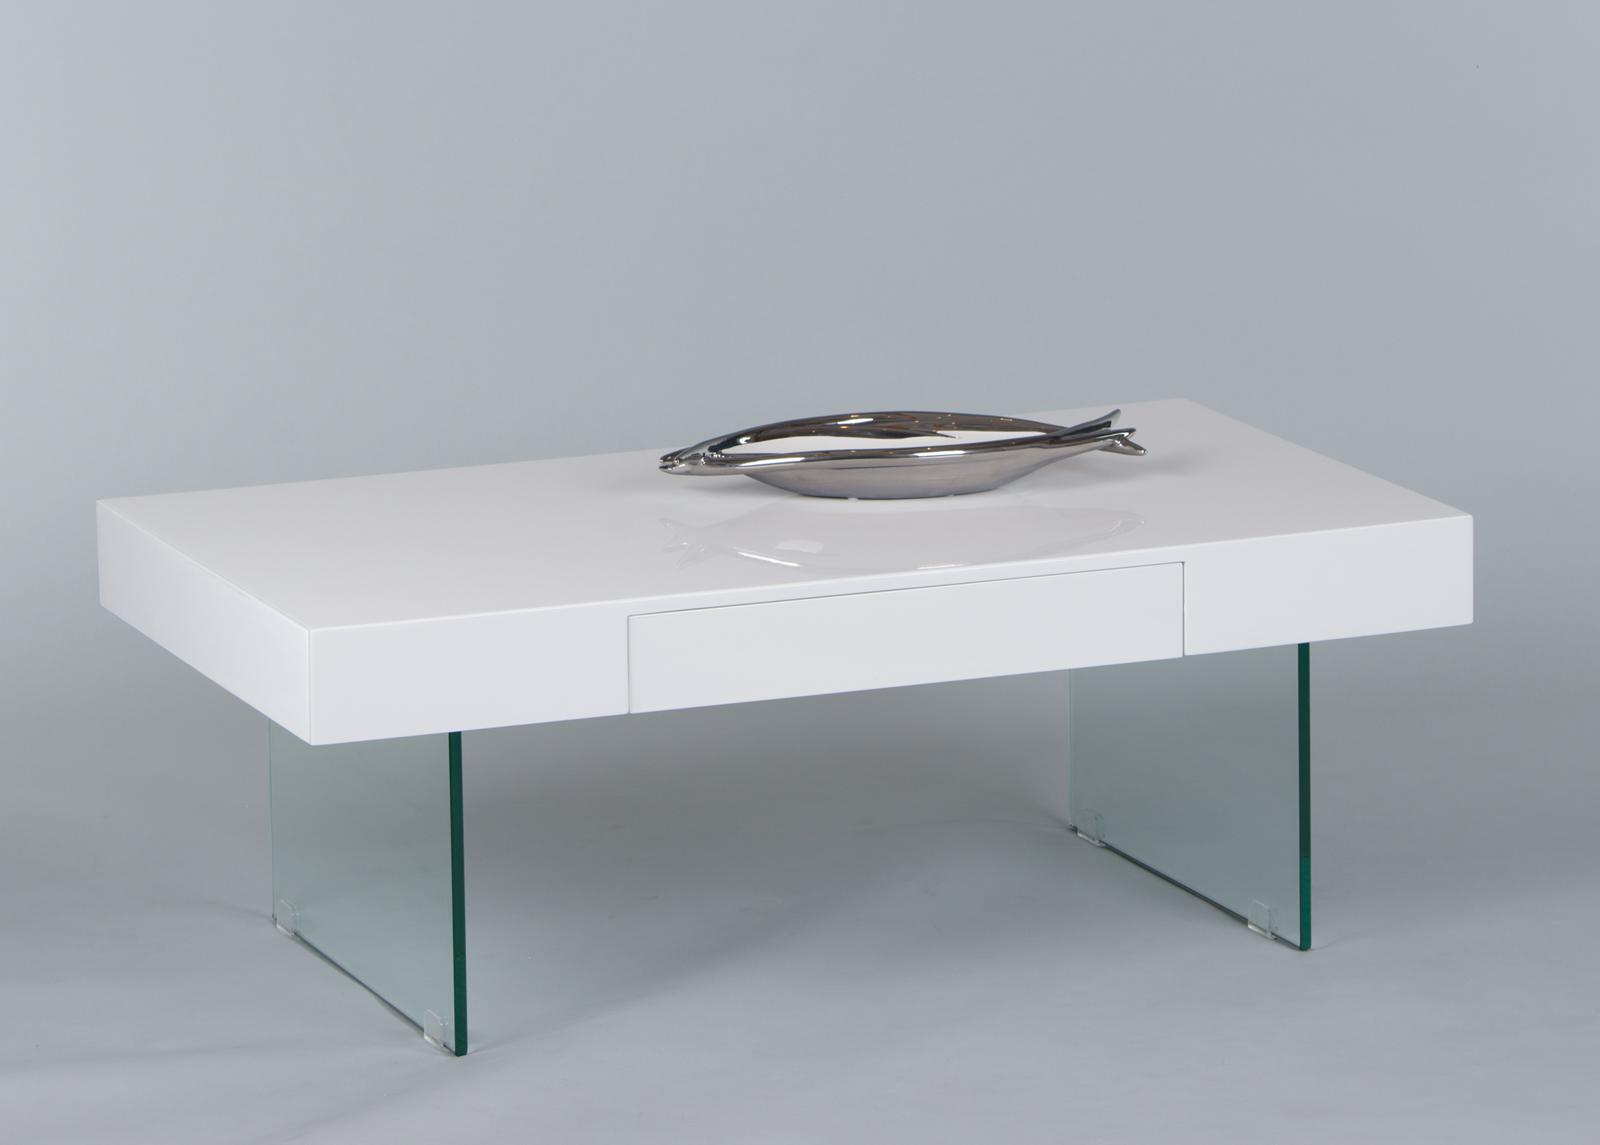 Sohvapöytä DAISY 110x60 cm